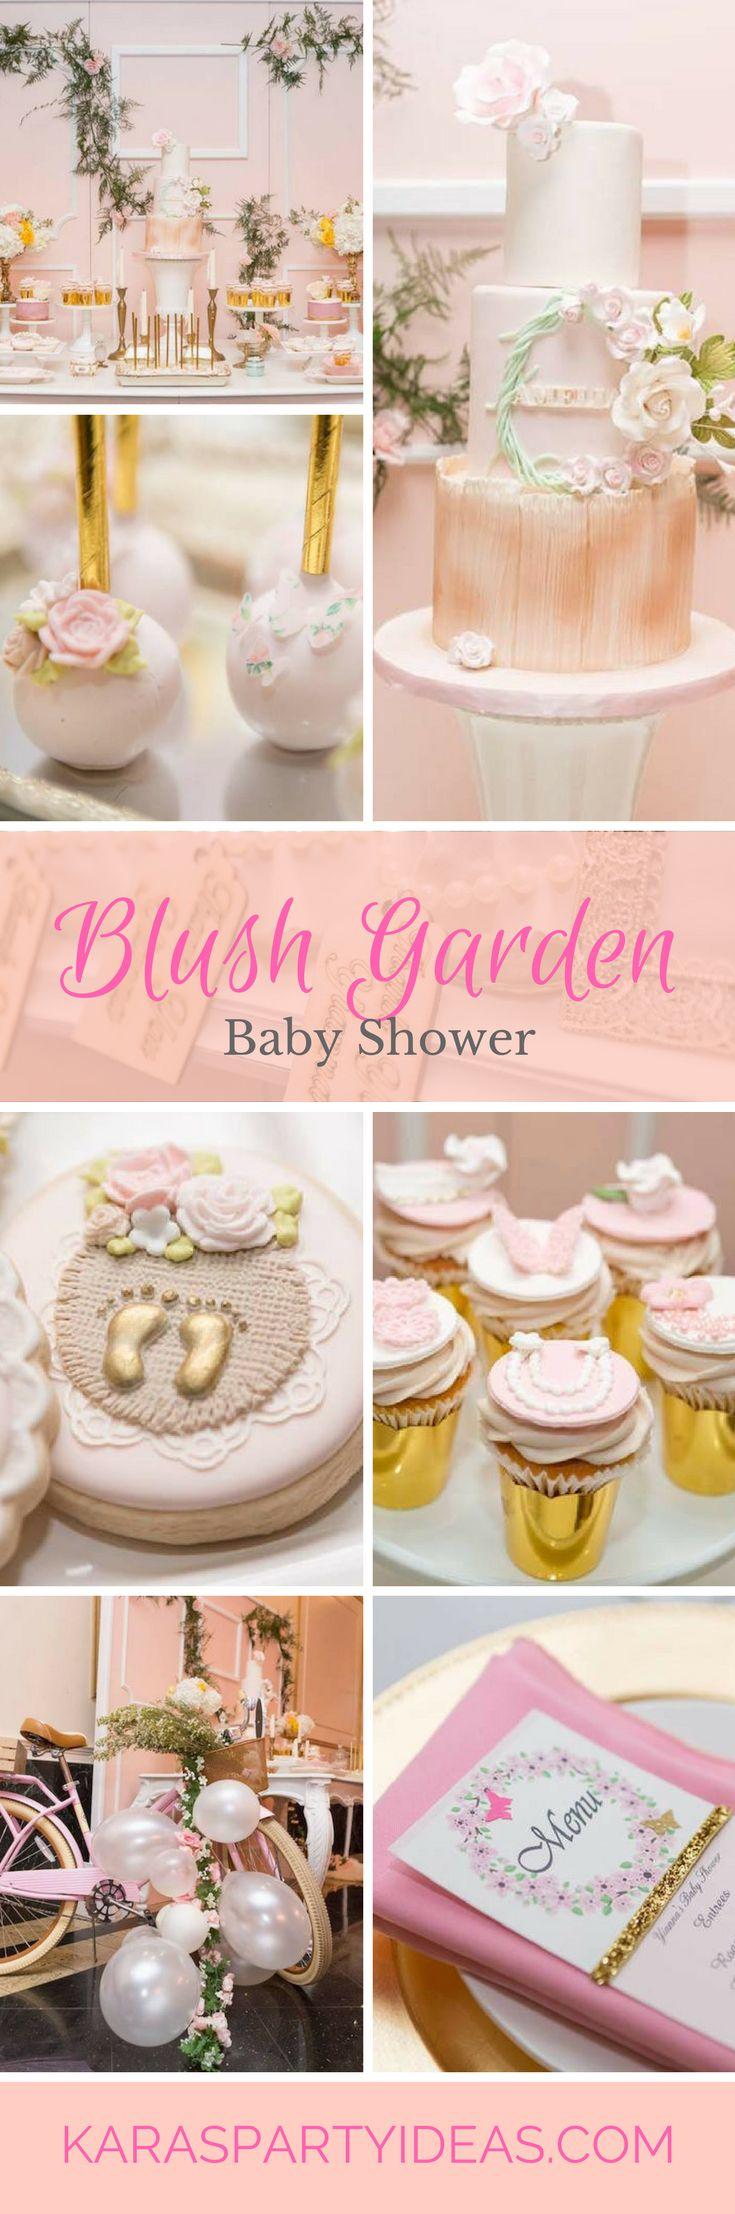 blush garden baby shower via karas party ideas